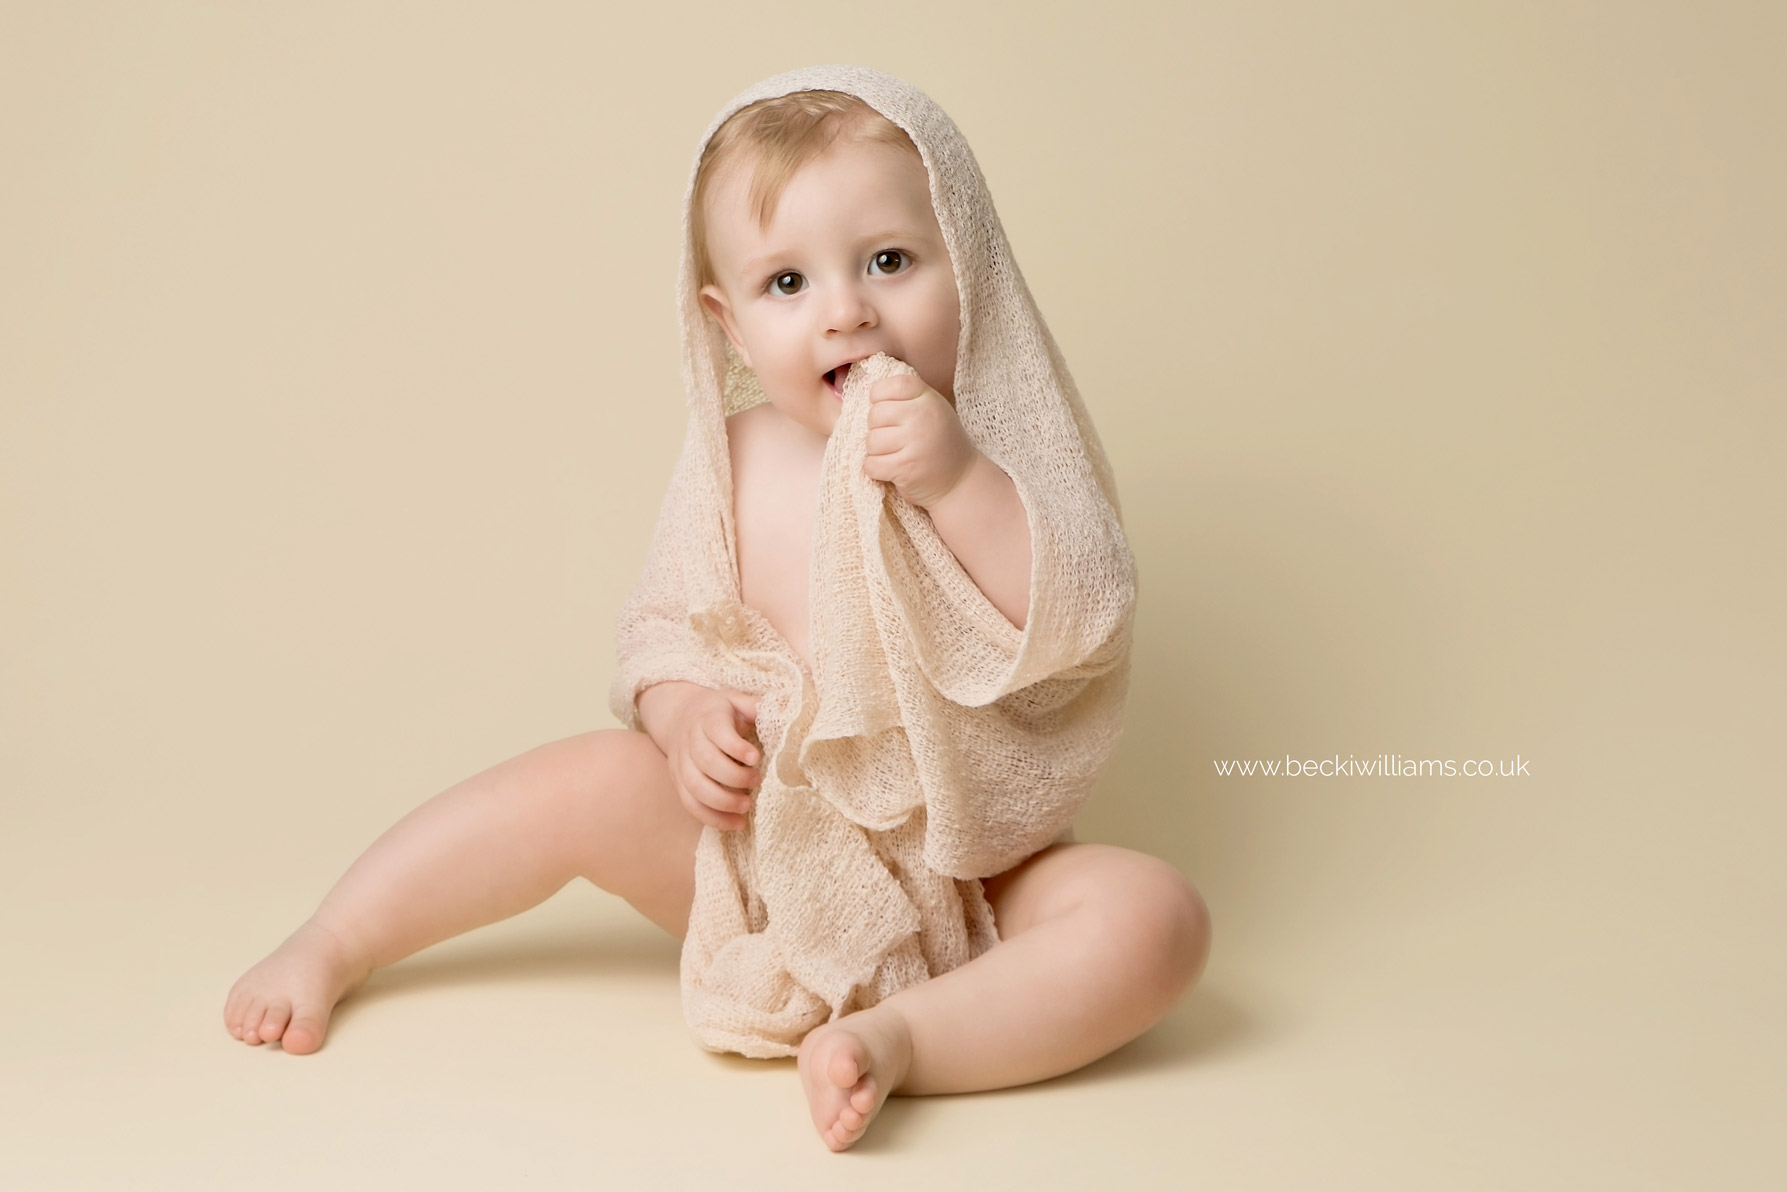 becki-williams-photography-hemel-hempstead-8-month-old-5.jpg